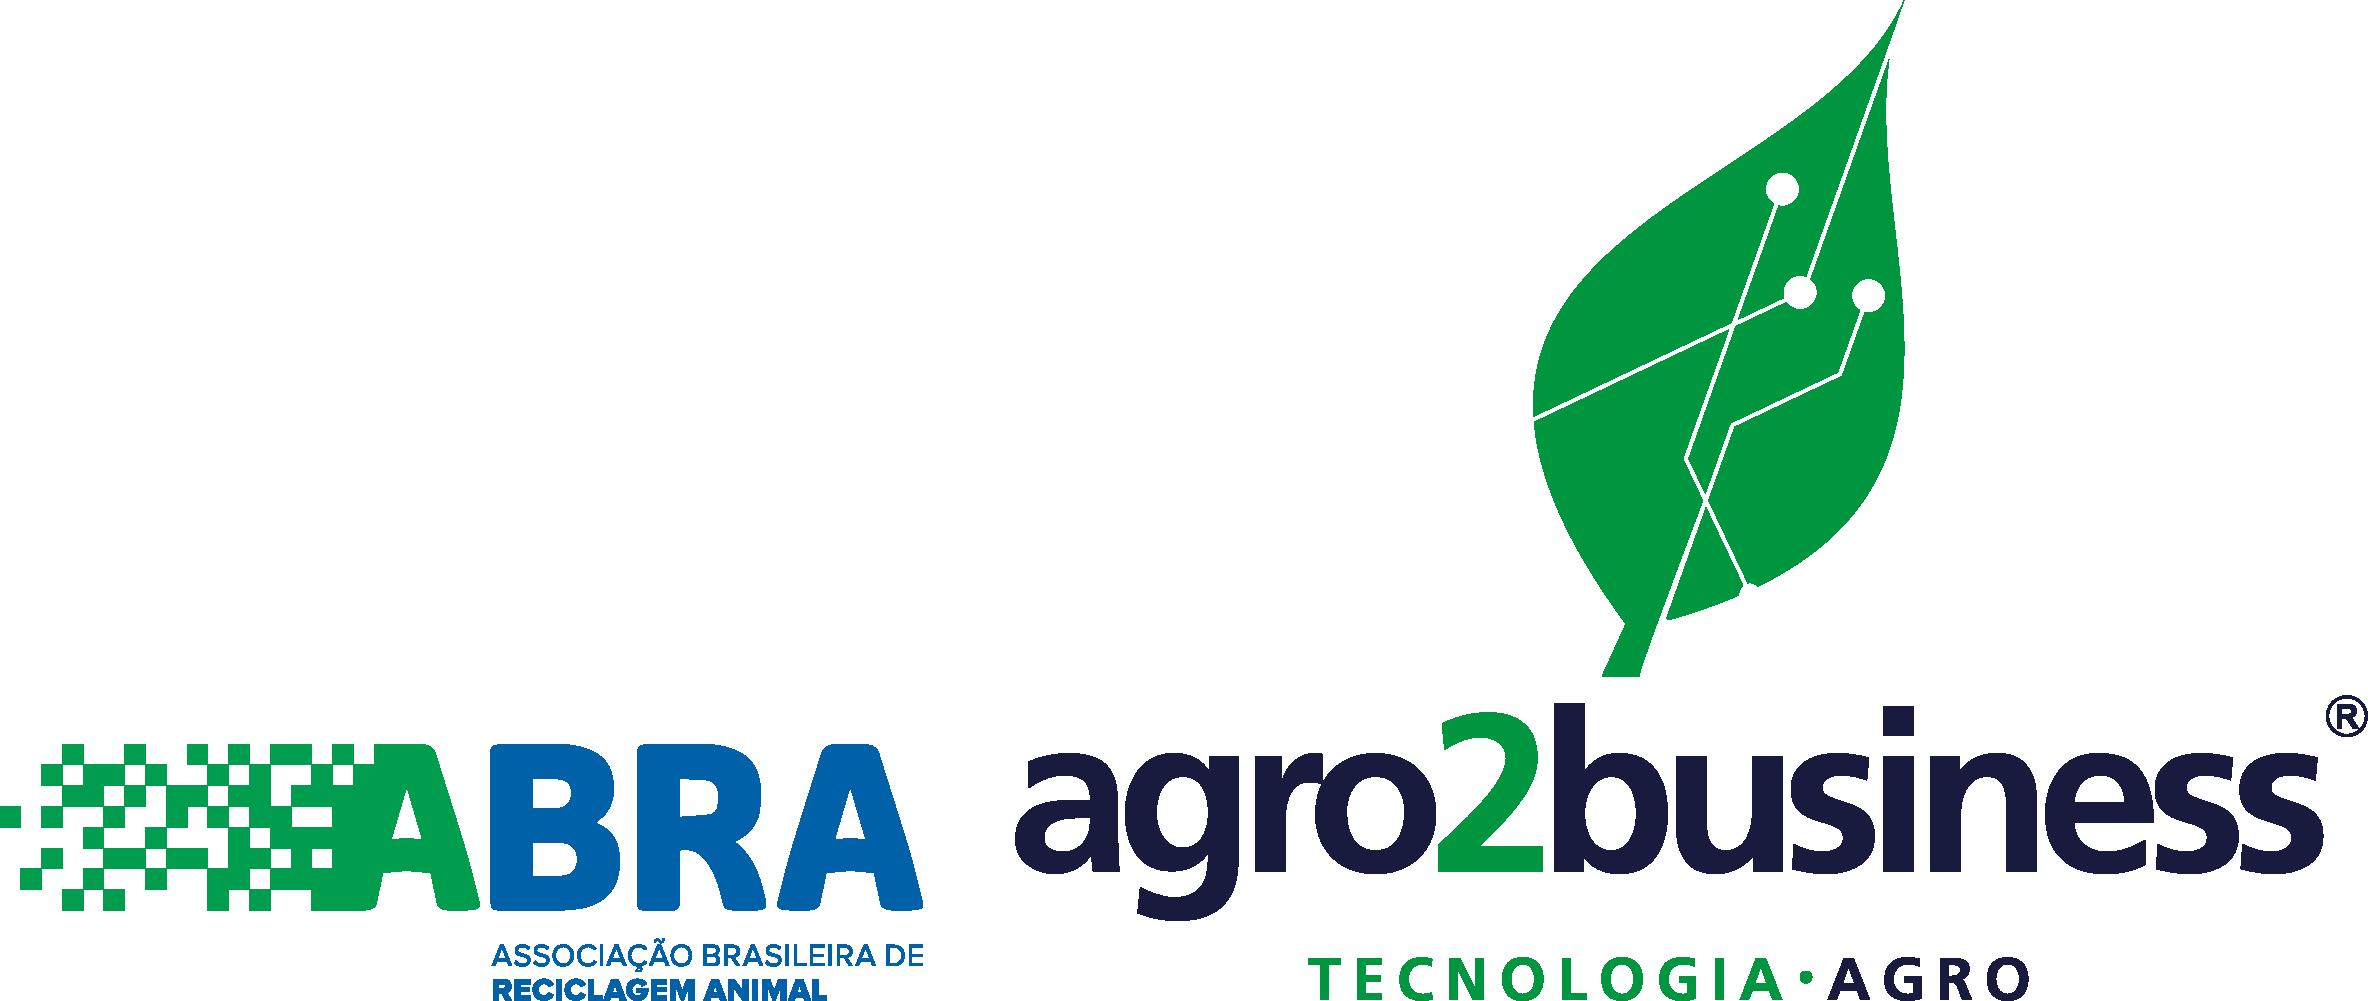 PARCERIA ABRA + AGRO2BUSINESS